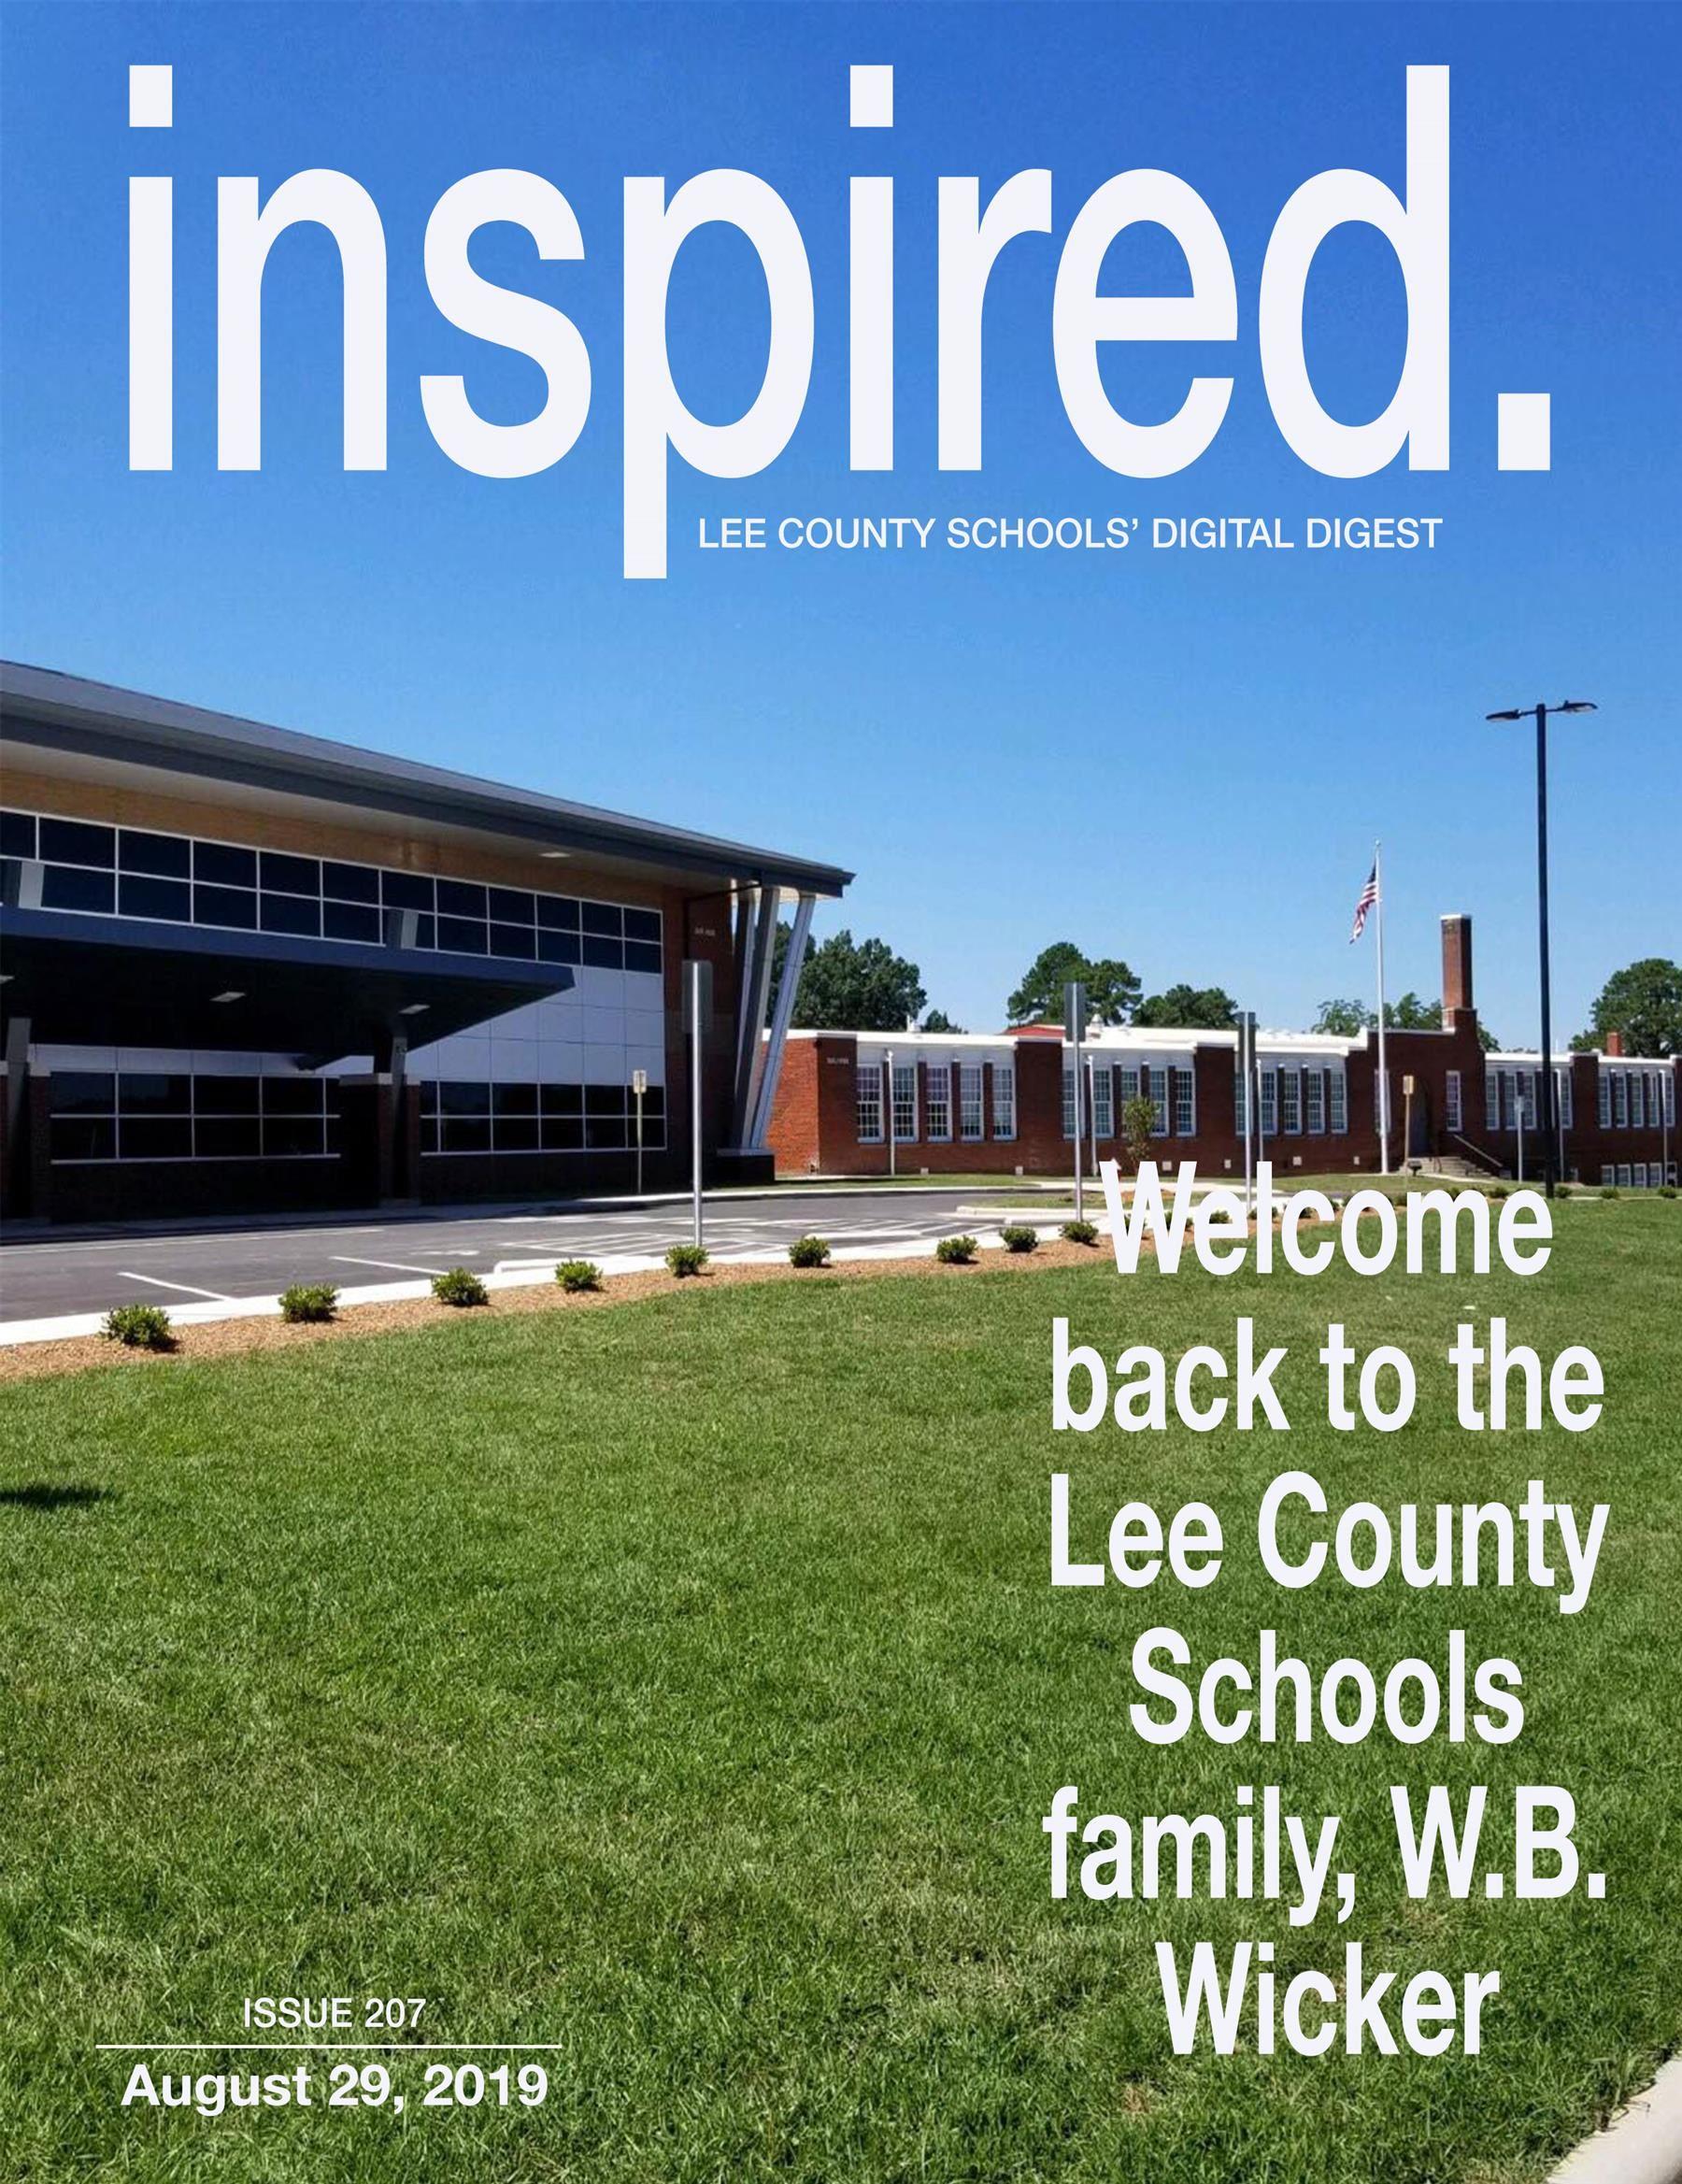 Lee County Schools / Homepage